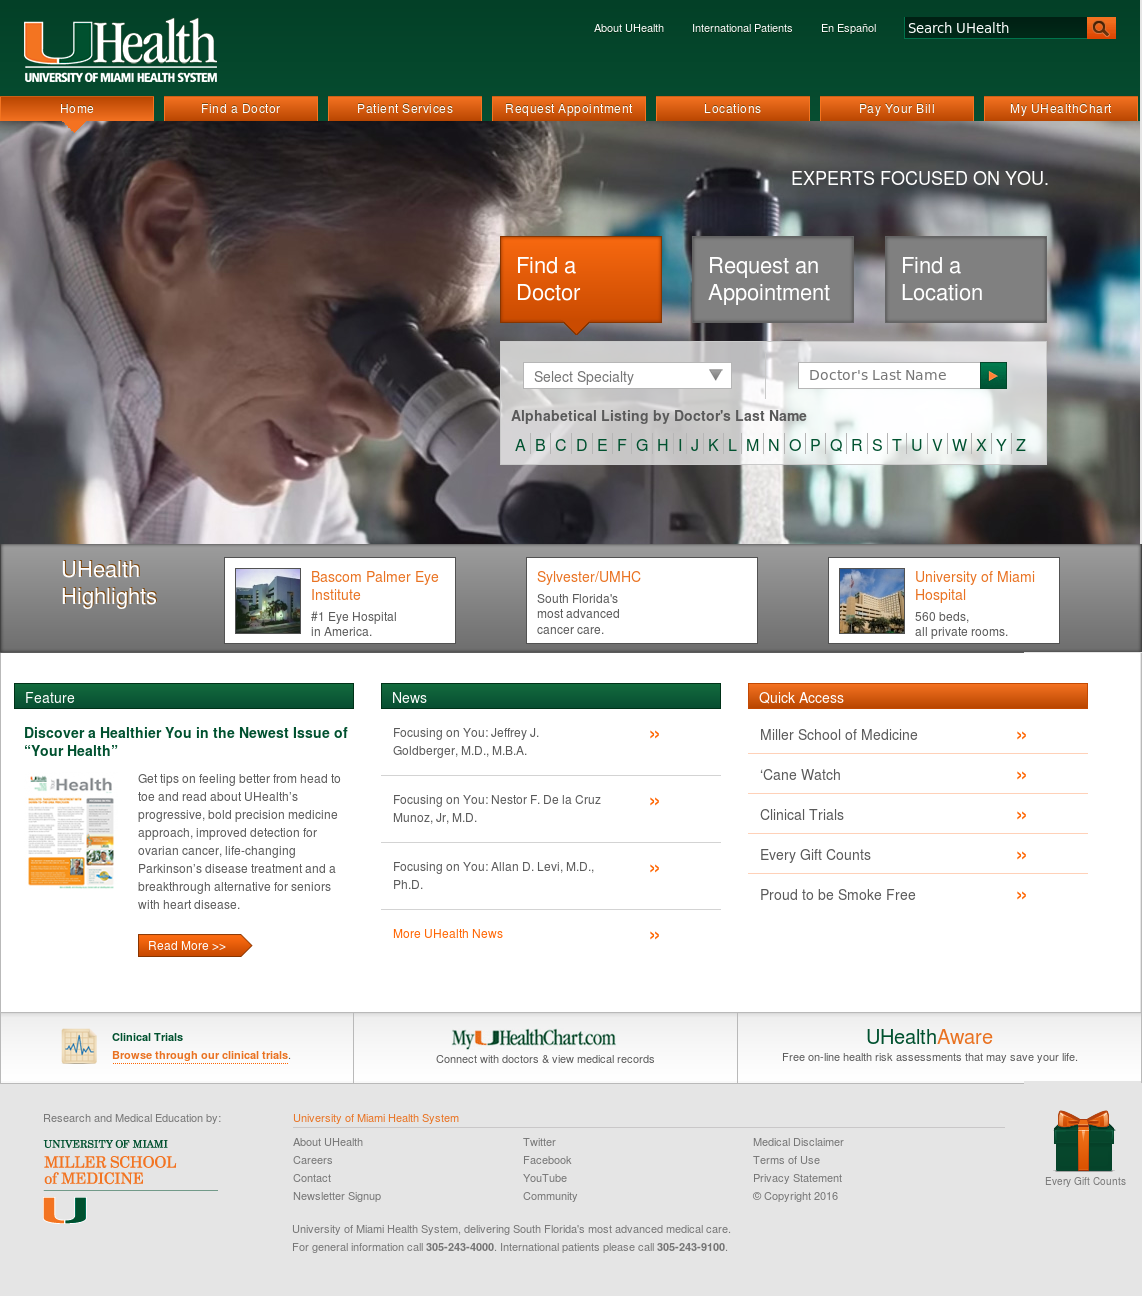 University of Miami Health System Competitors, Revenue and